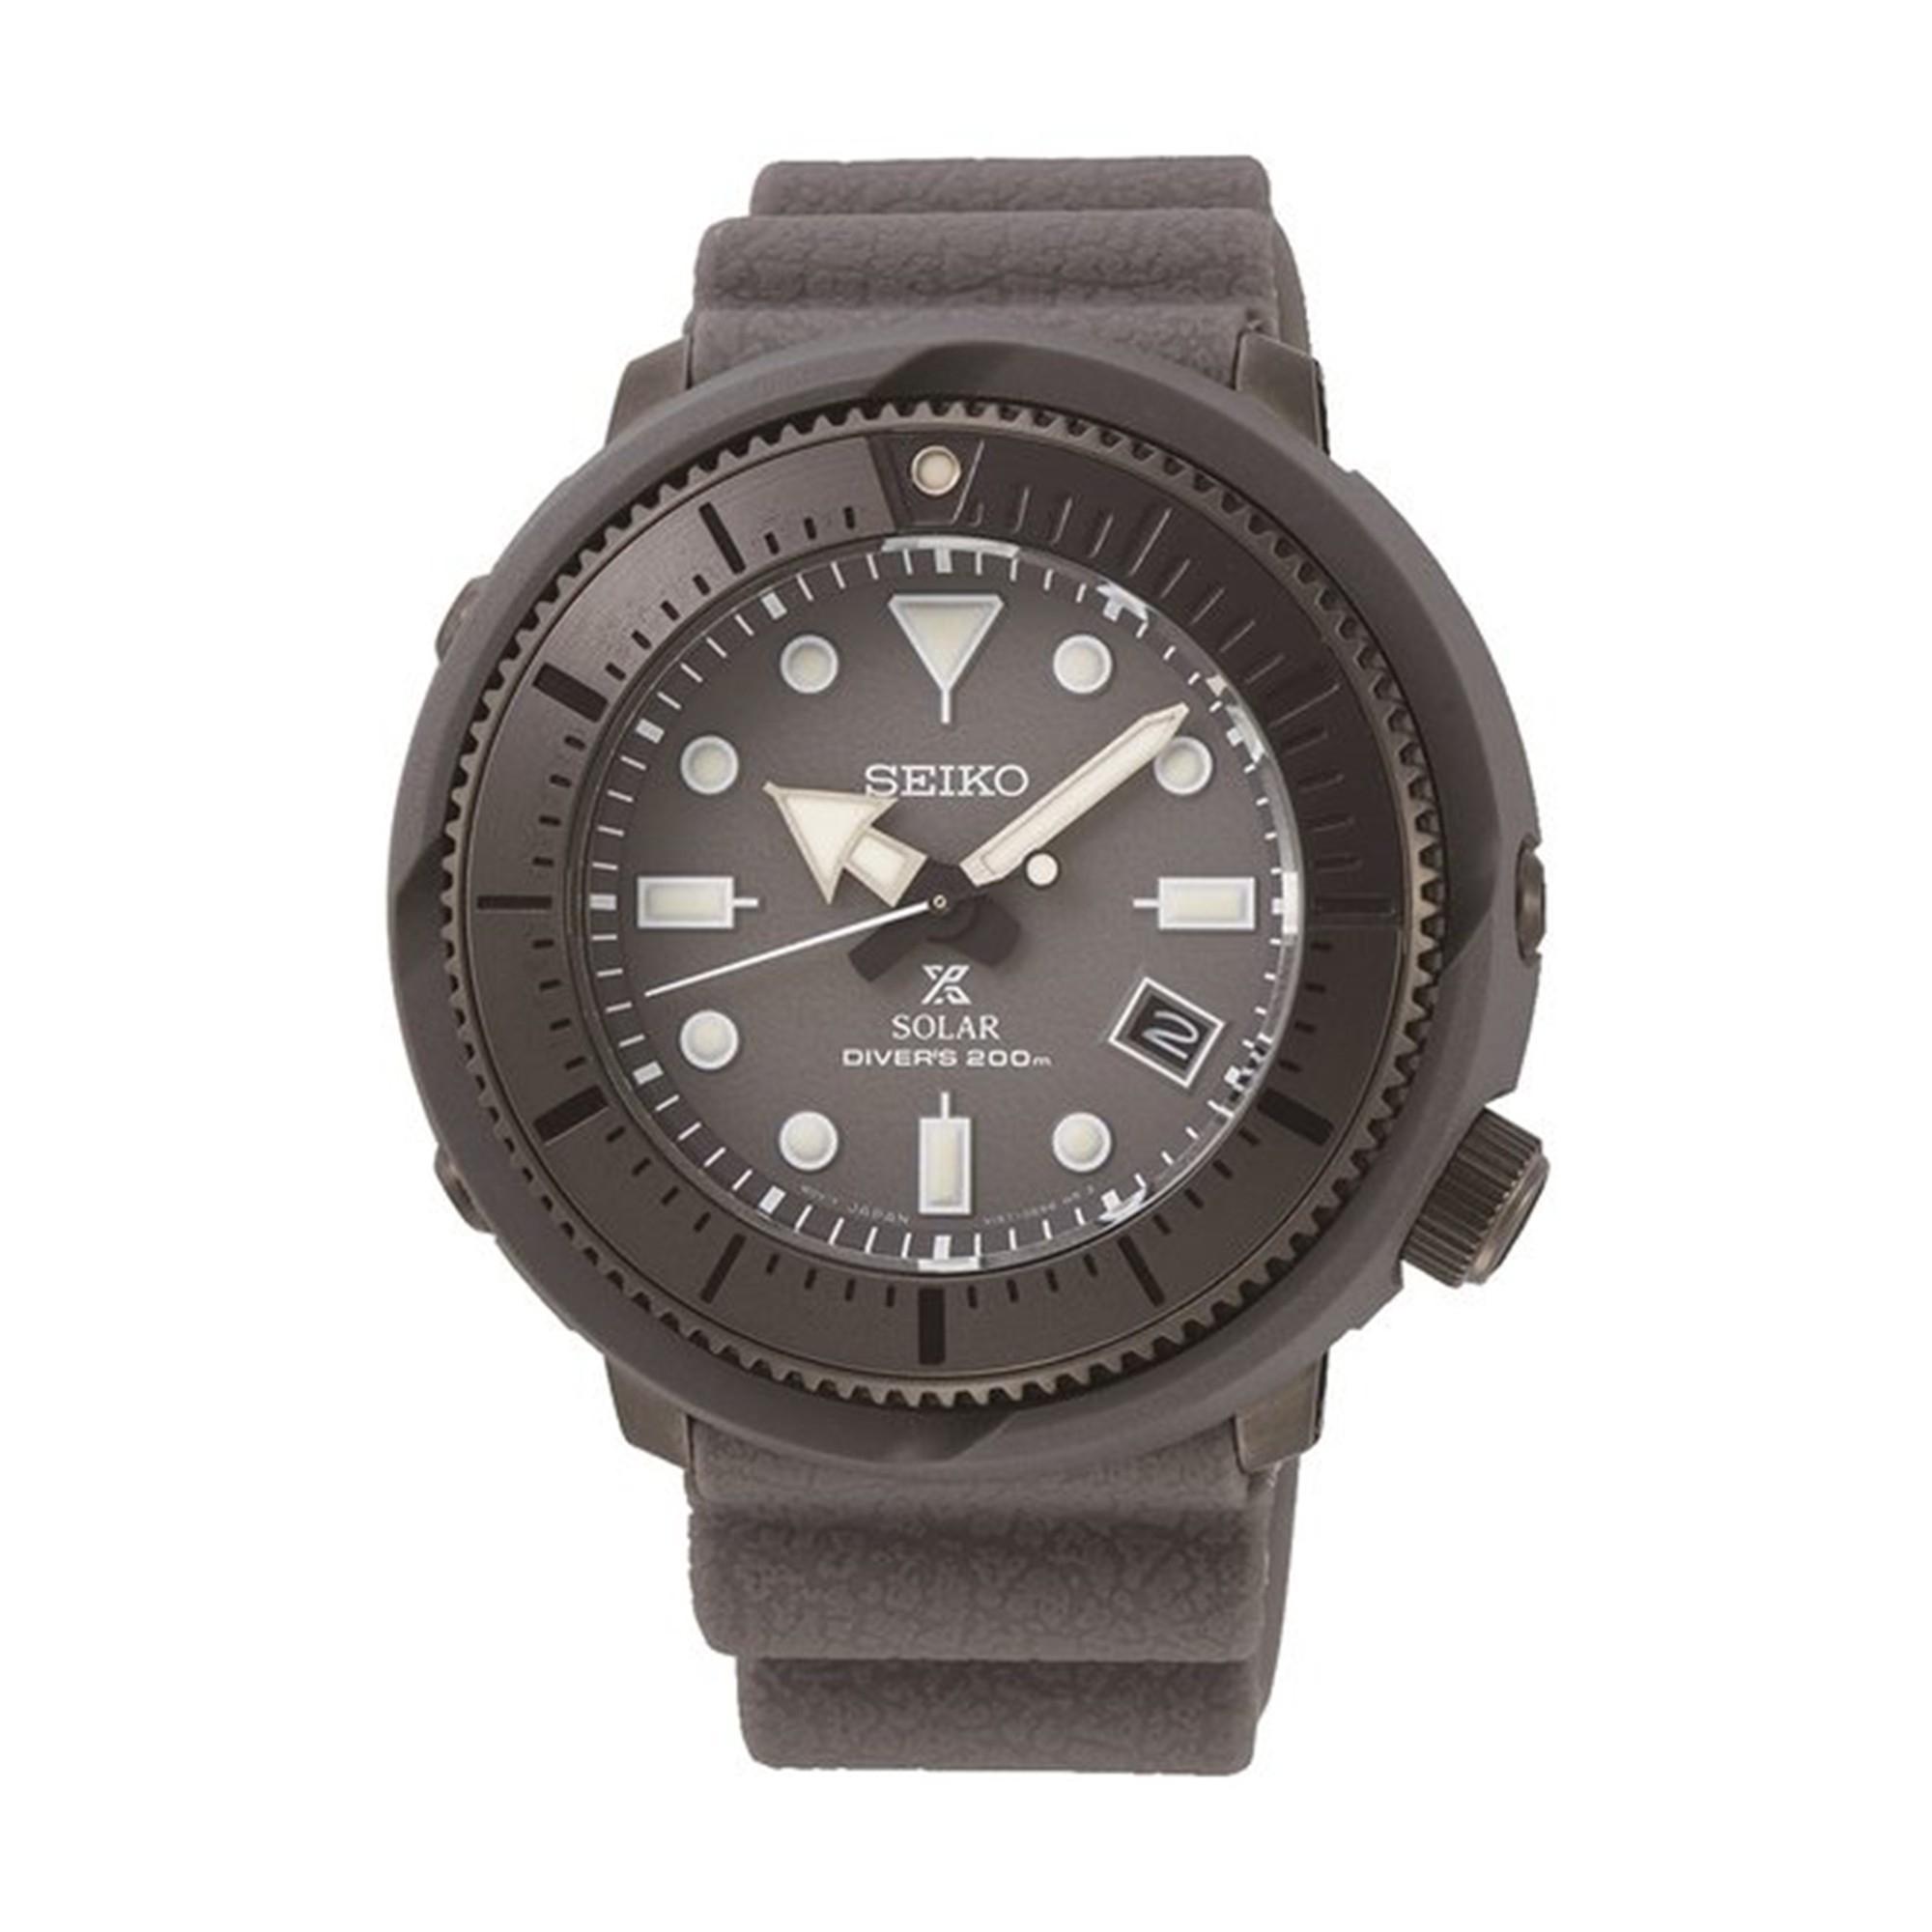 Seiko Prospex Street Series Mens Watch SNE537P1 Grey - £216 delivered using code @ Chisholm Hunter